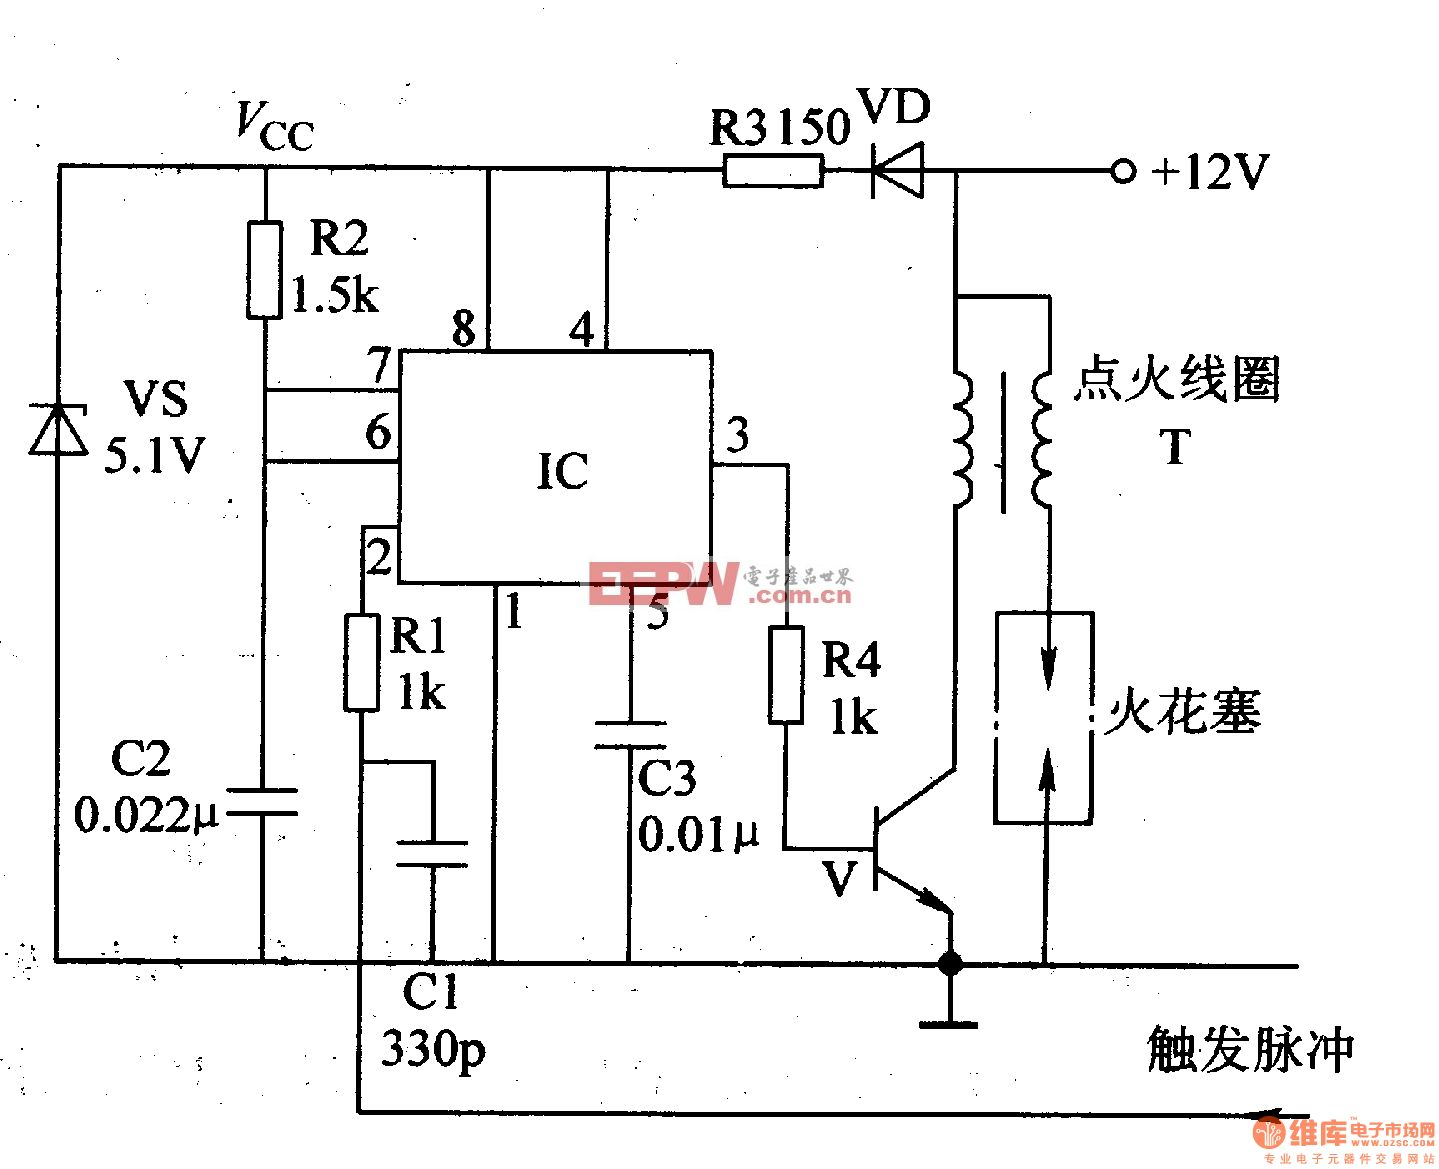 "IC与电阻器Rl、R2和电容器Cl-C3等组成单稳态电路。   +l2V电压先经一极管VD和R3降压限流后,再经VS稳压为+5lV(Vcc),作为lC的工作电压。   在刚接通电源时,IC的3脚输出低电平,V截止,点火电路不工作。当IC的2脚有负脉冲信号输人时,单稳态电路被触发翻转,由稳态变为暂态,IC的3脚输出高电平,使V导通,点火线圈T中有电流流过。与此同时,IC内却的放电管截止,+51V(Vcc)电压经电阻器RZ向电容器C2充电,使IC1的6脚、7""脚电压上升,当C2两端电压上升至2忆c/"